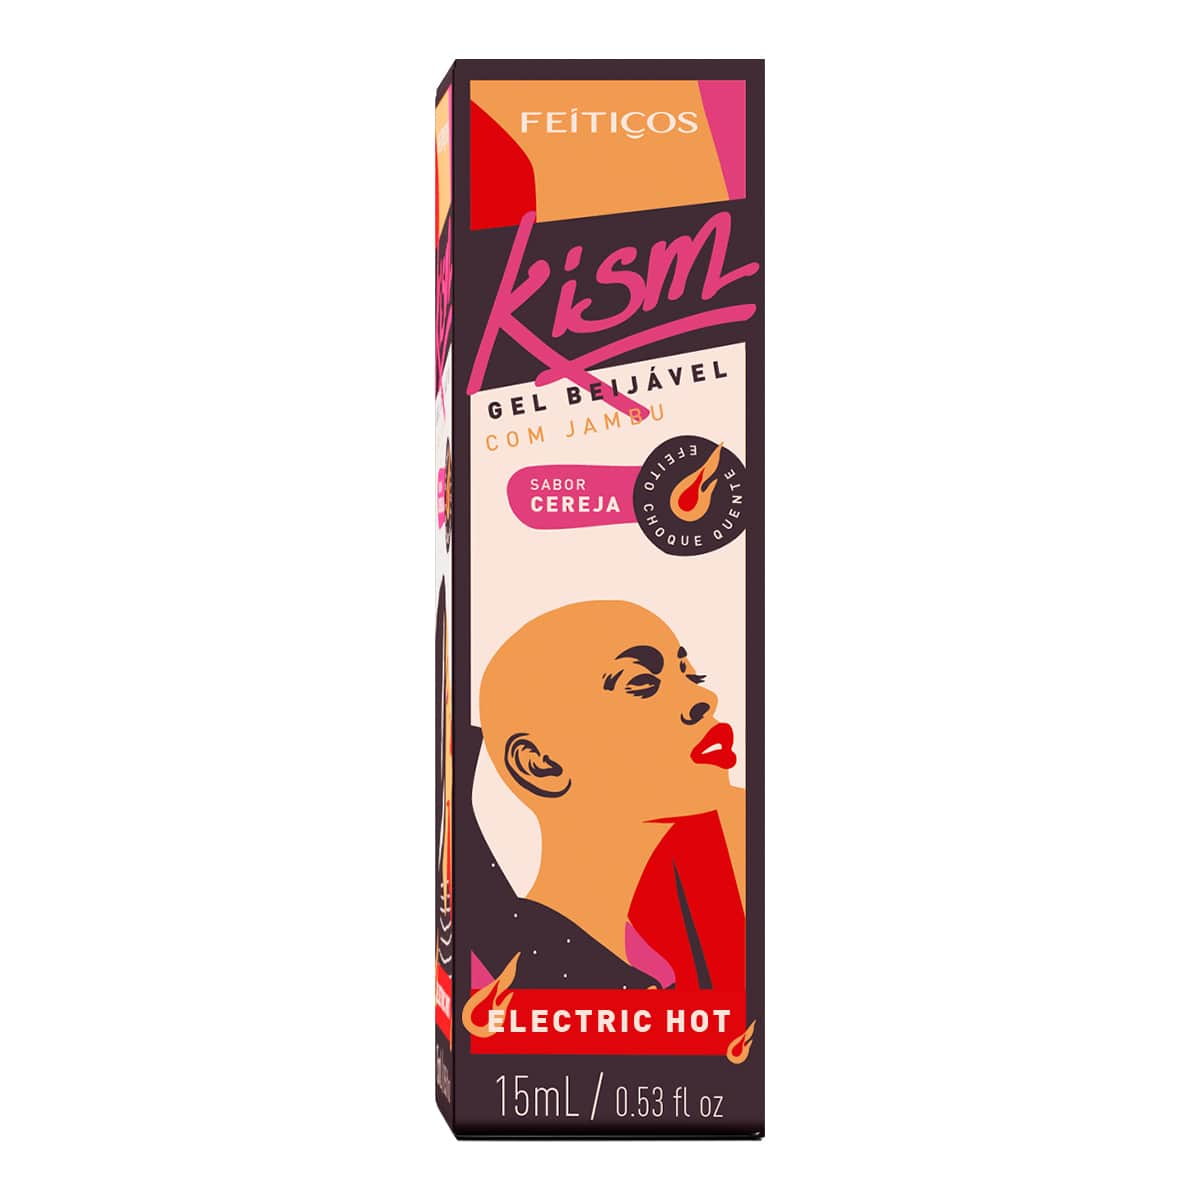 KISM - Gel Beijável com Jambu - Sabor Cereja - Electric Hot